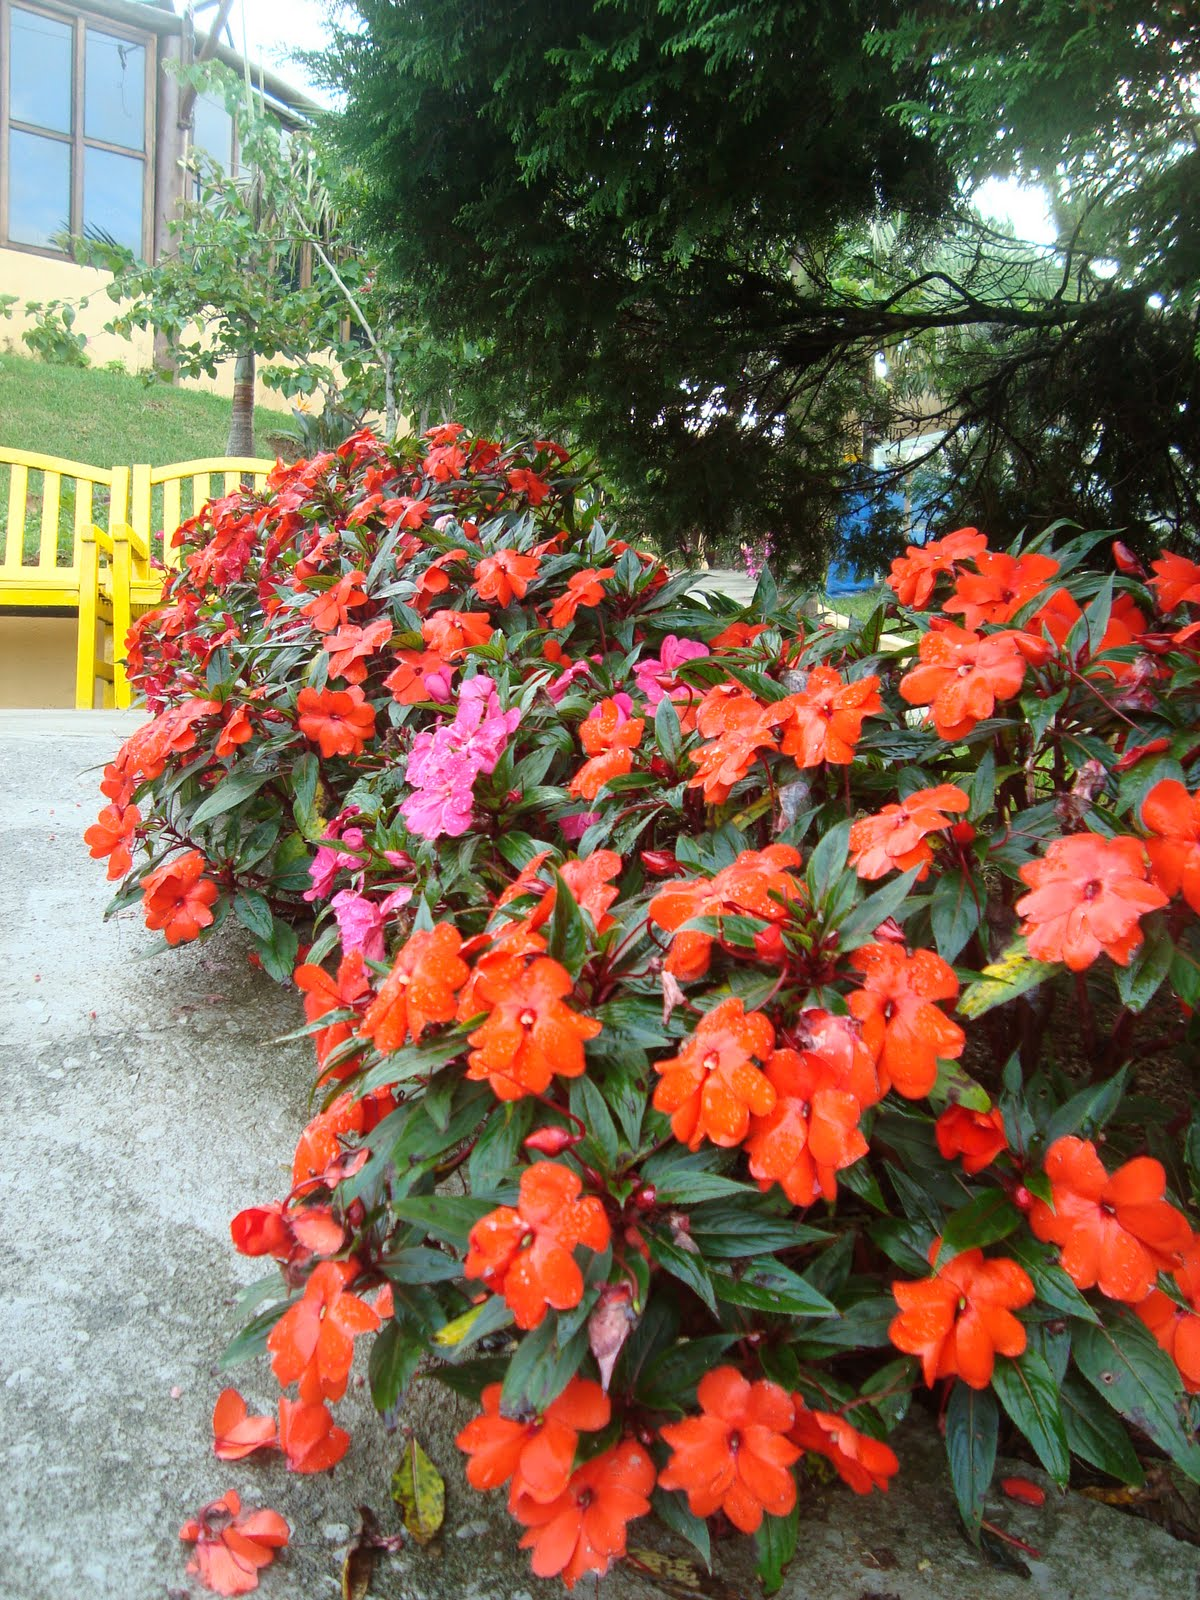 Os paisagistas plantas ornamentais de sombra - Flores de sombra ...